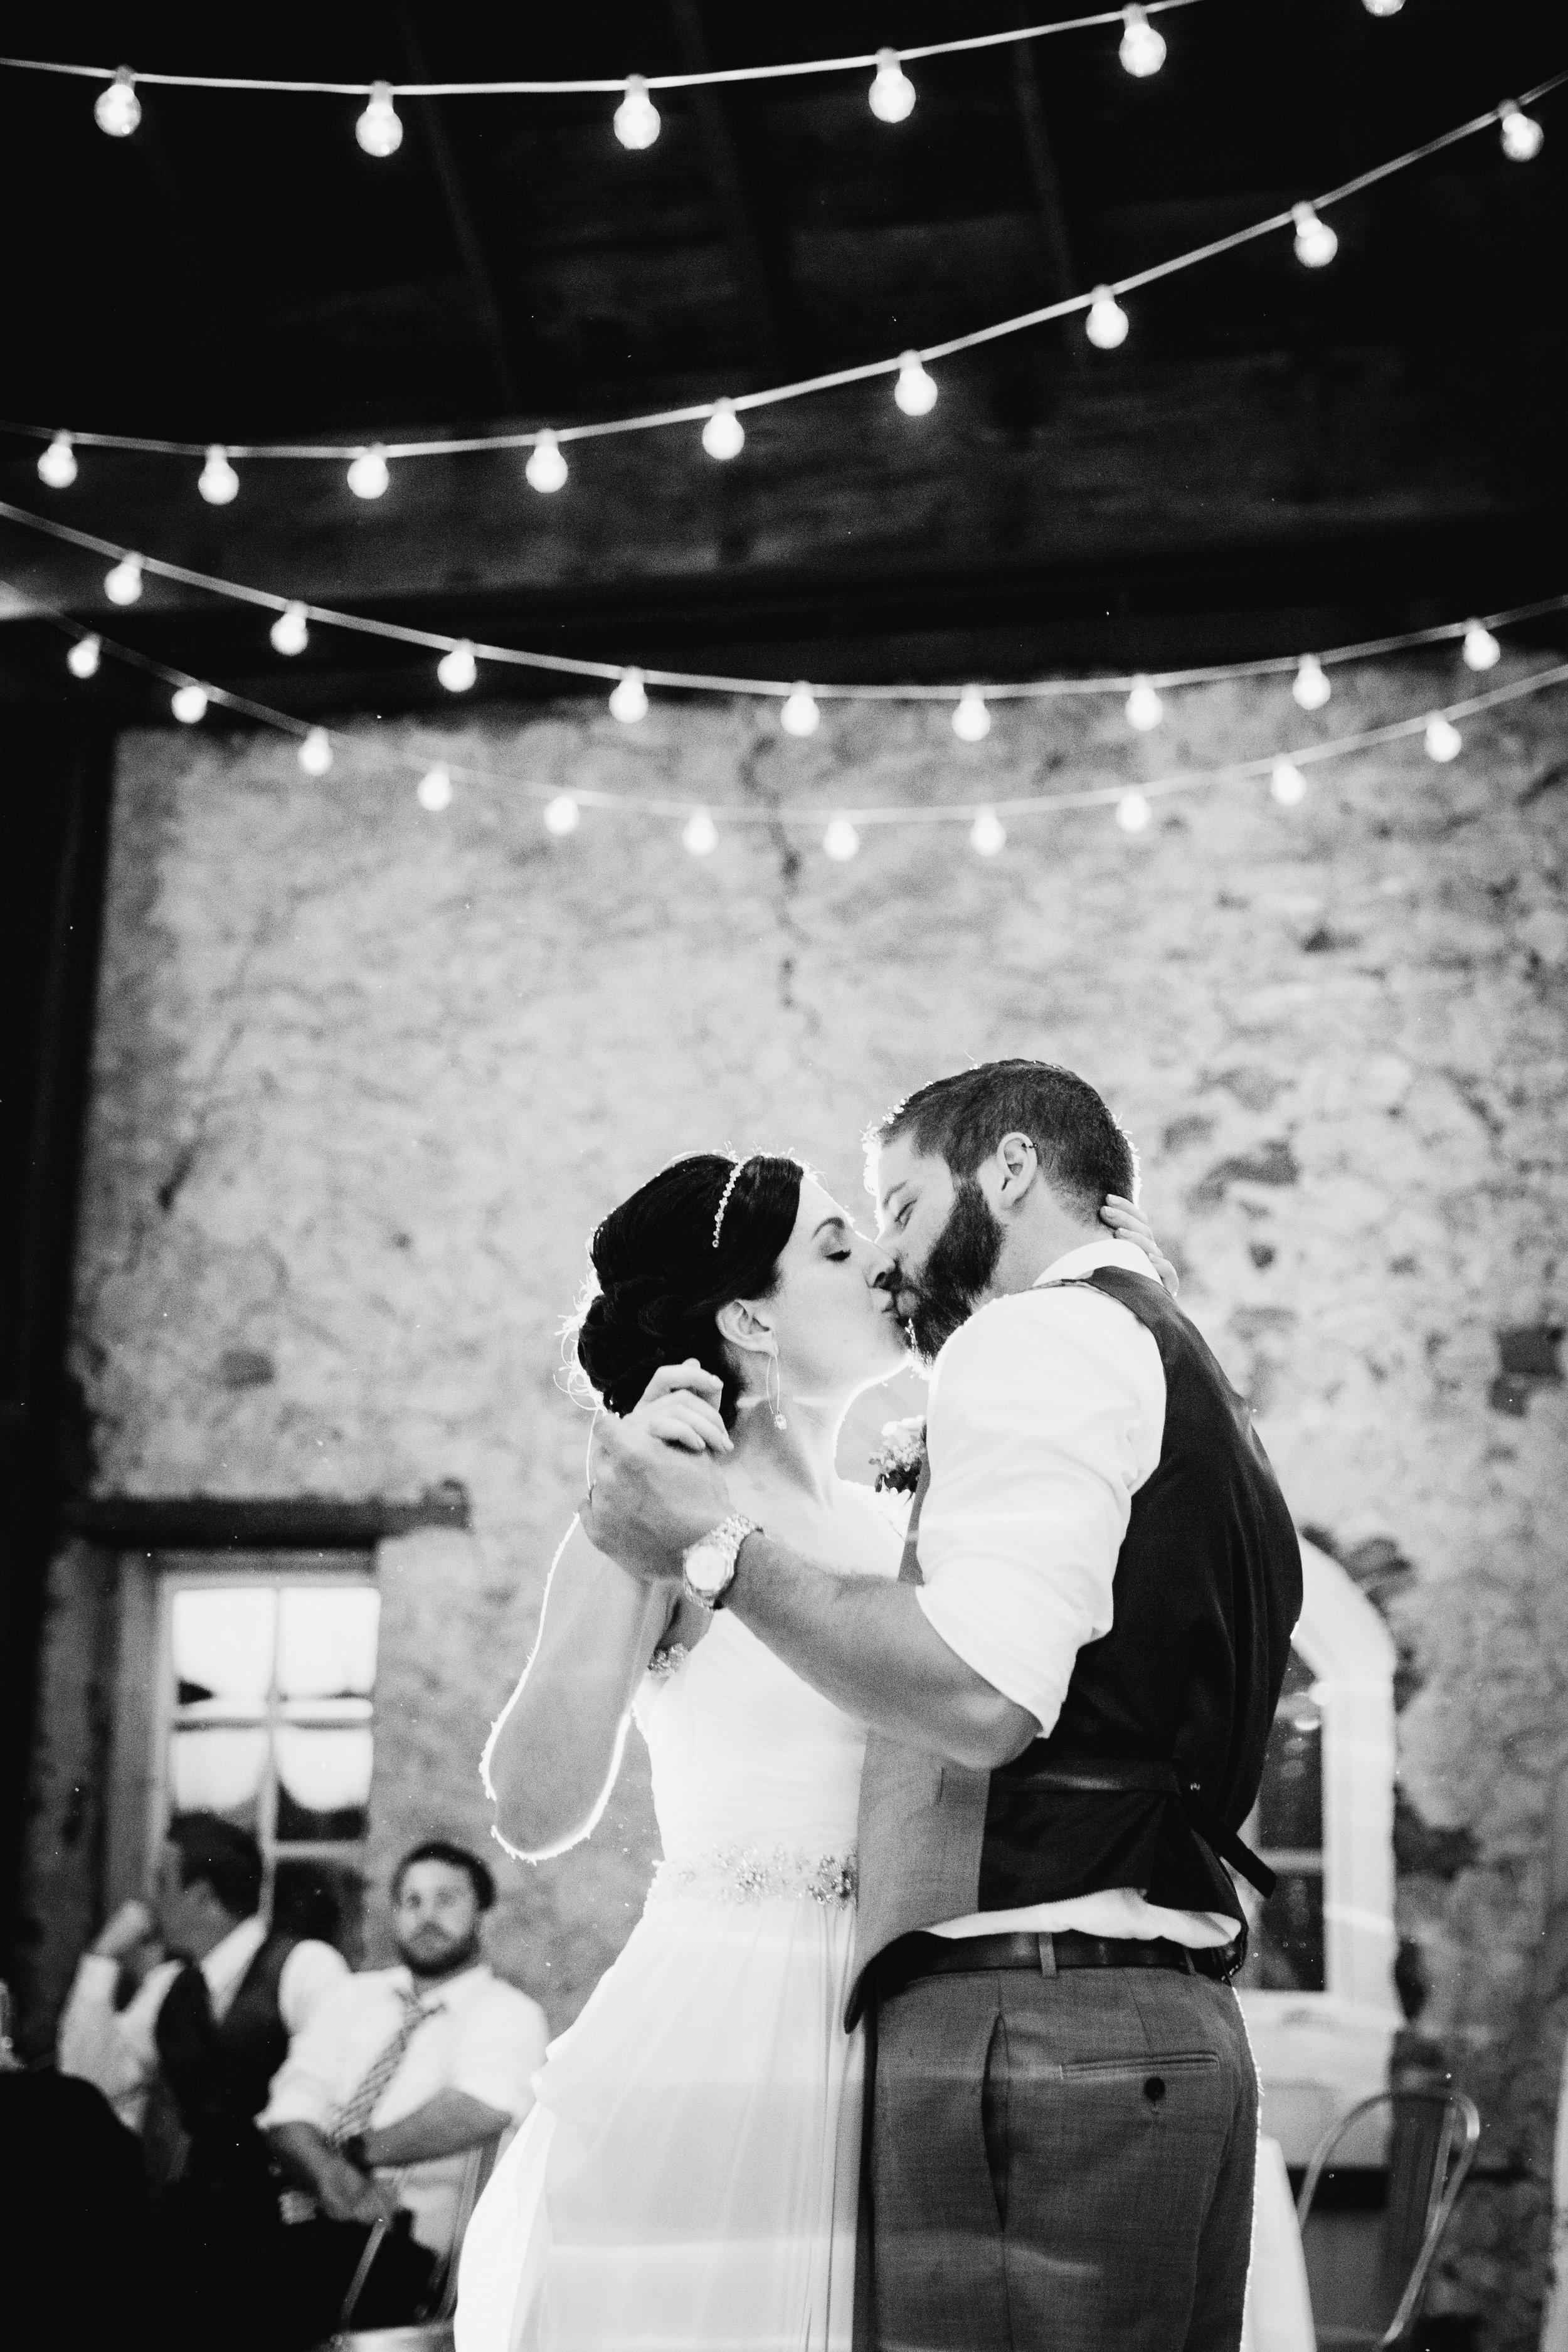 TYLER ARBORETUM WEDDING PHOTOGRAPHY LOVESTRUCK PICTURES-080.jpg